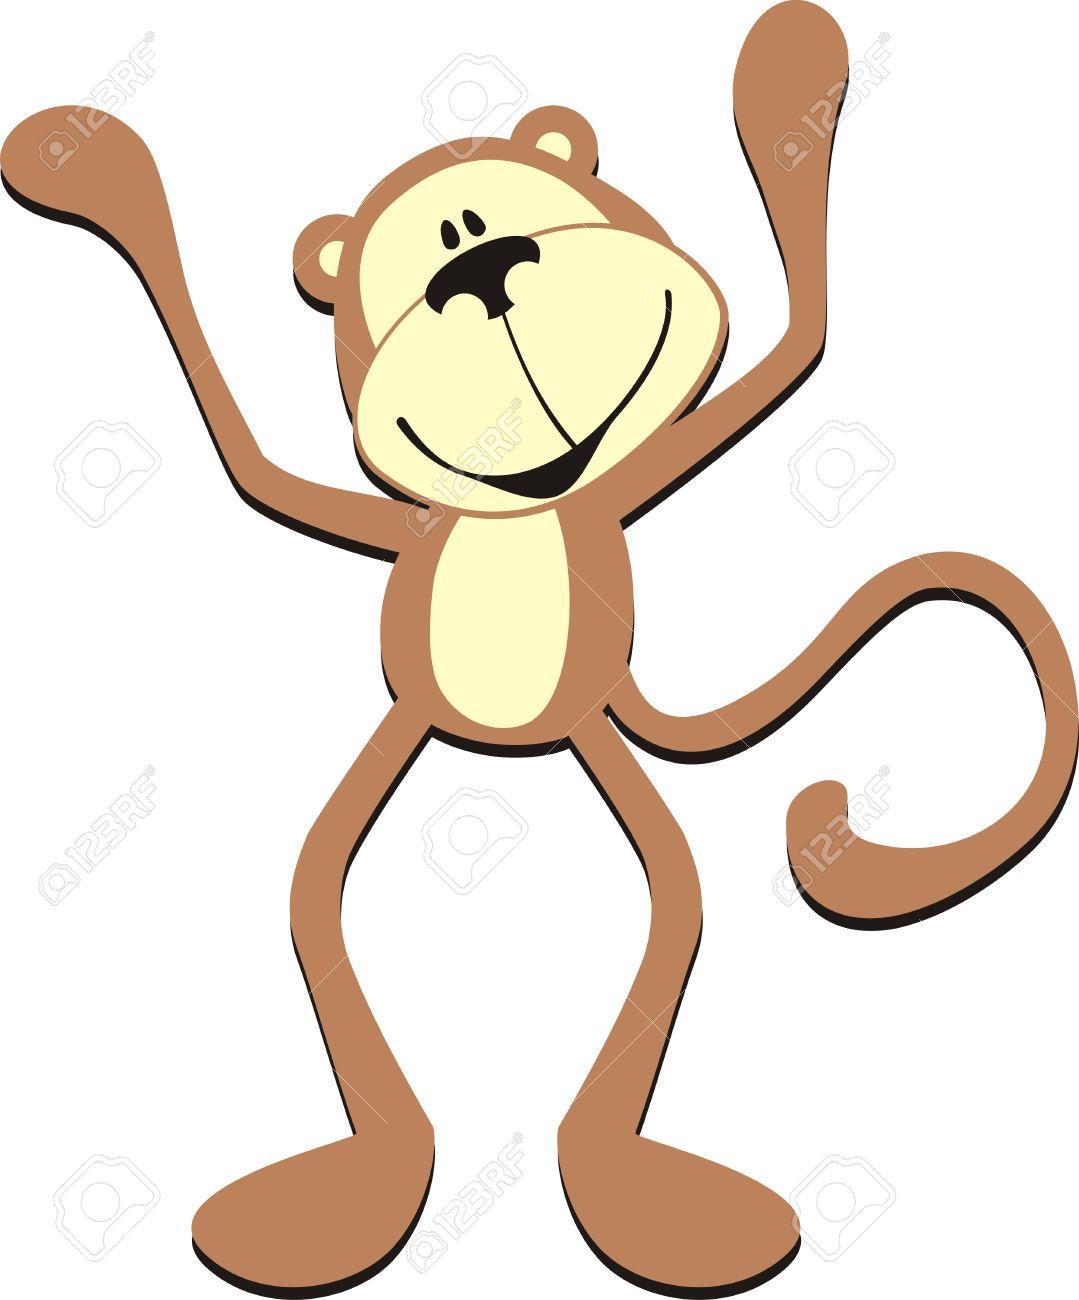 isolated cartoon greeting monkey Stock Vector - 8017341